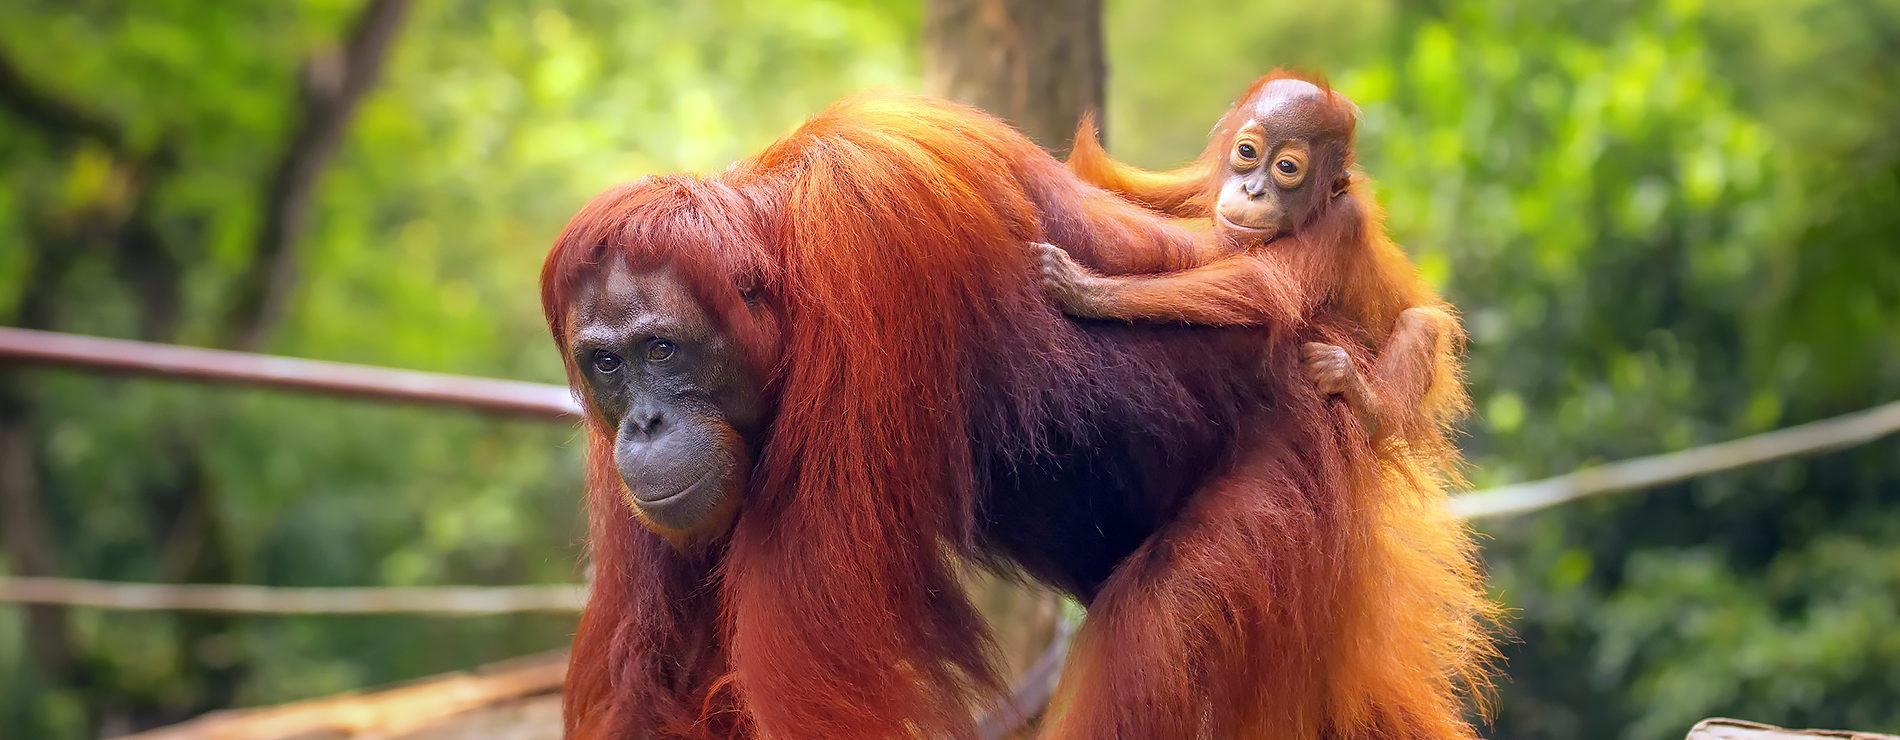 10 saker du måste uppleva i Malaysia & Borneo